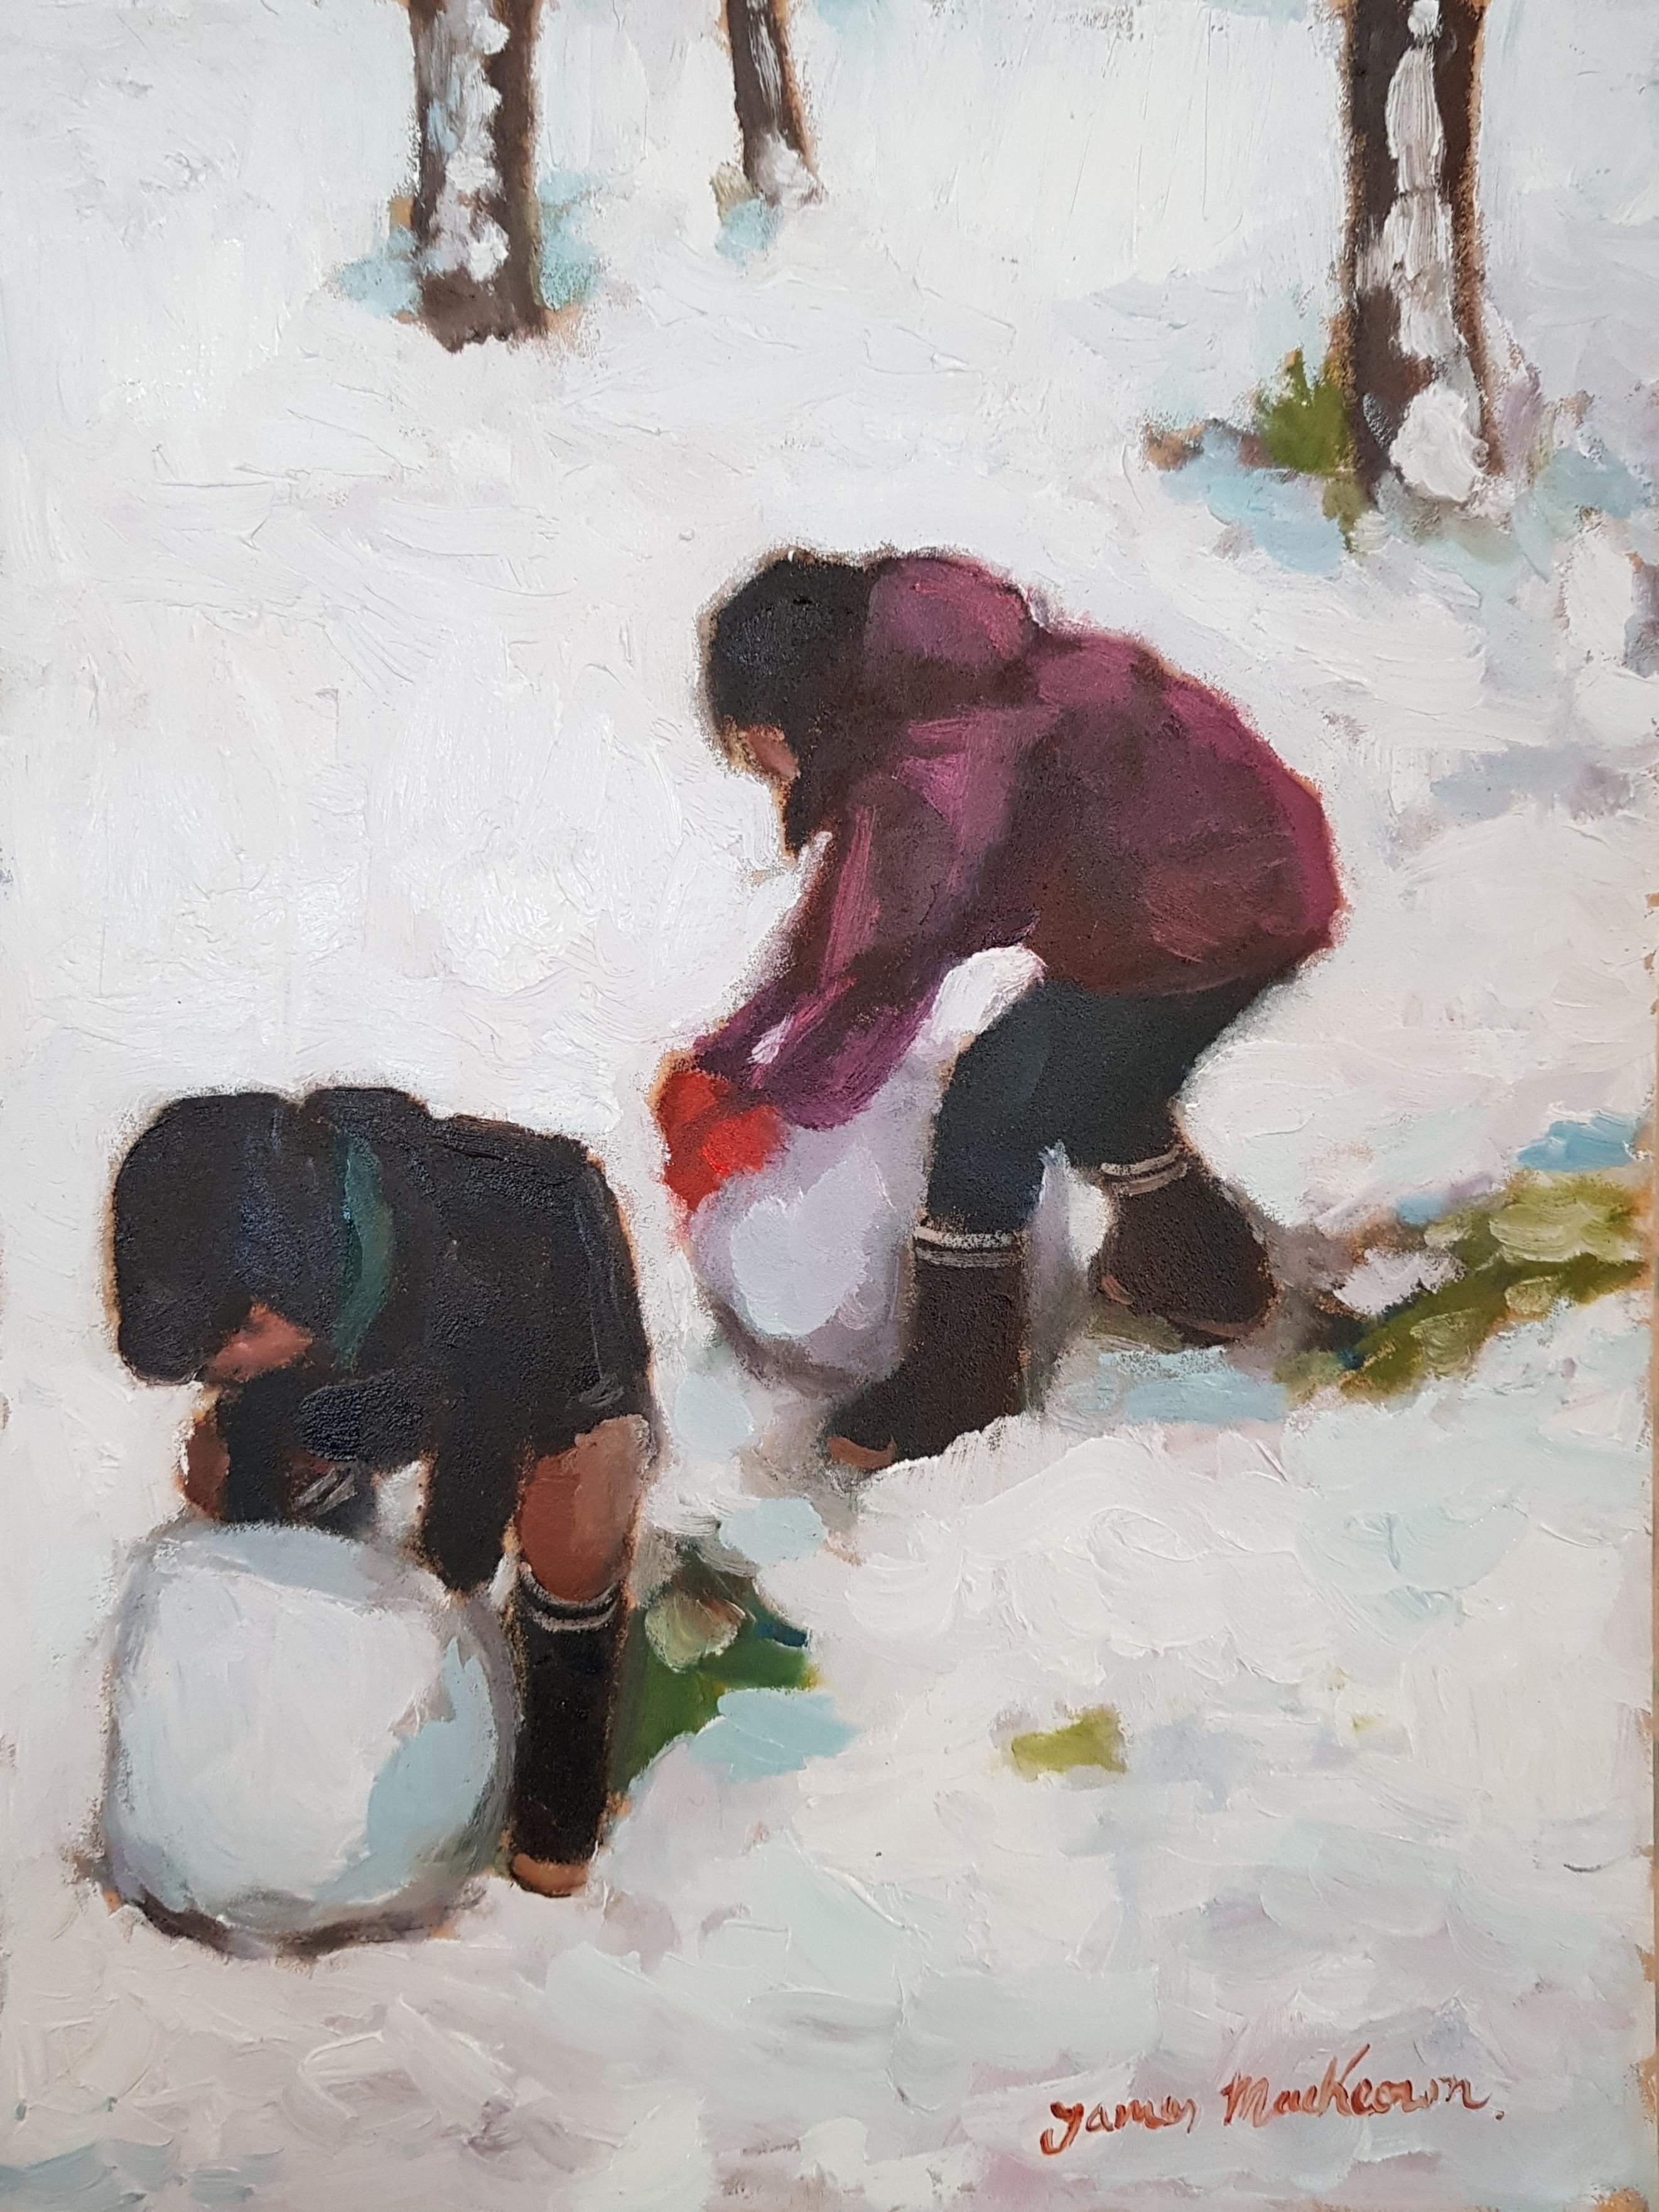 "James MacKeown 'The Big Snow Balls' oil on canvas 15.5"" x 9"""